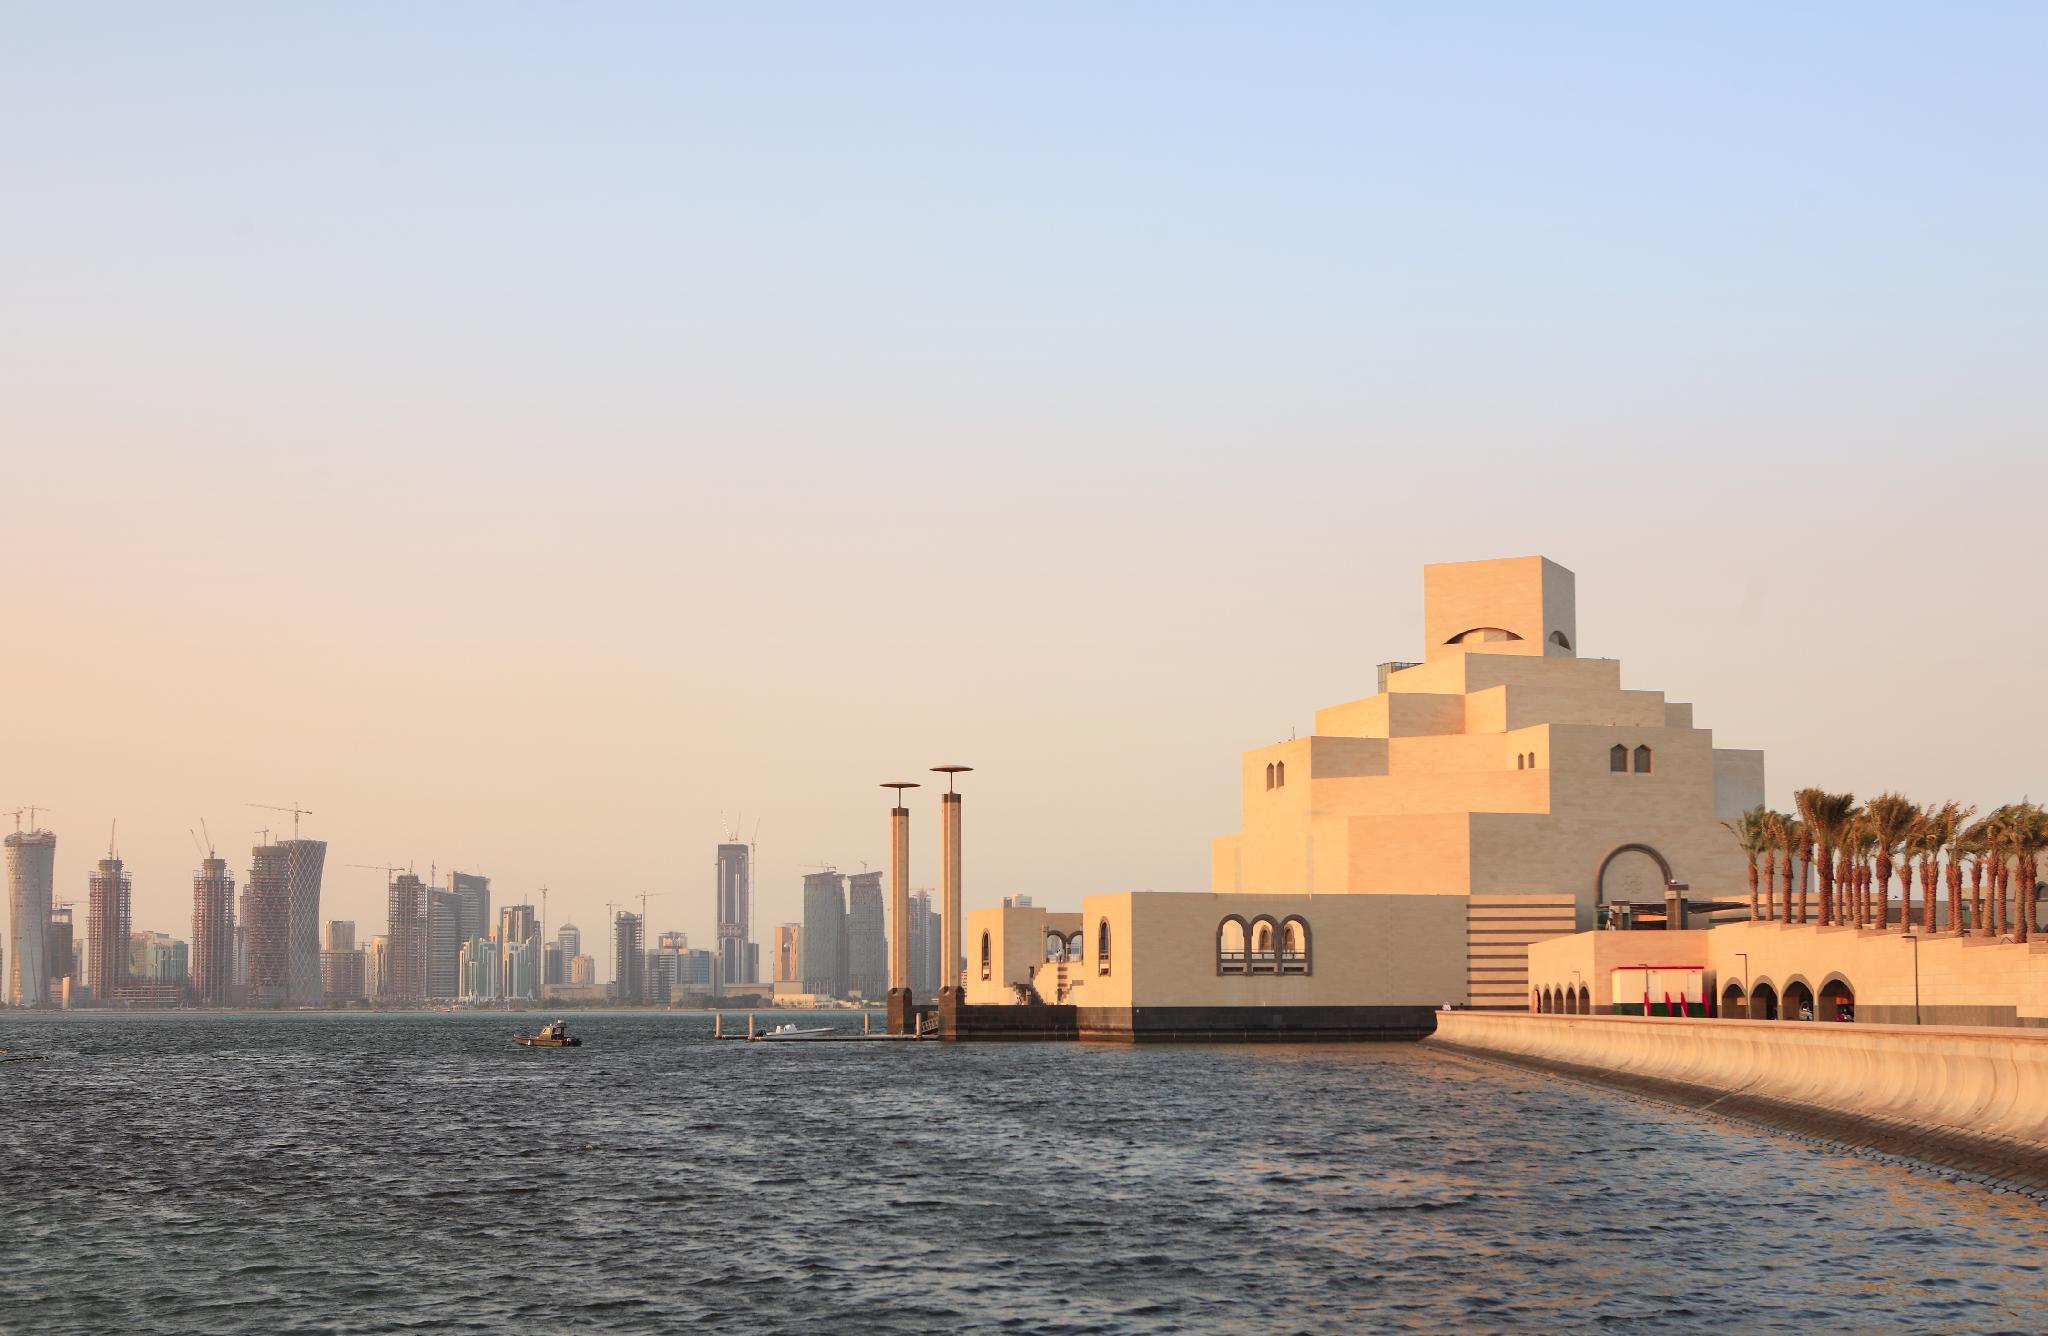 qatar hotels online hotel reservations for hotels in qatar rh agoda com